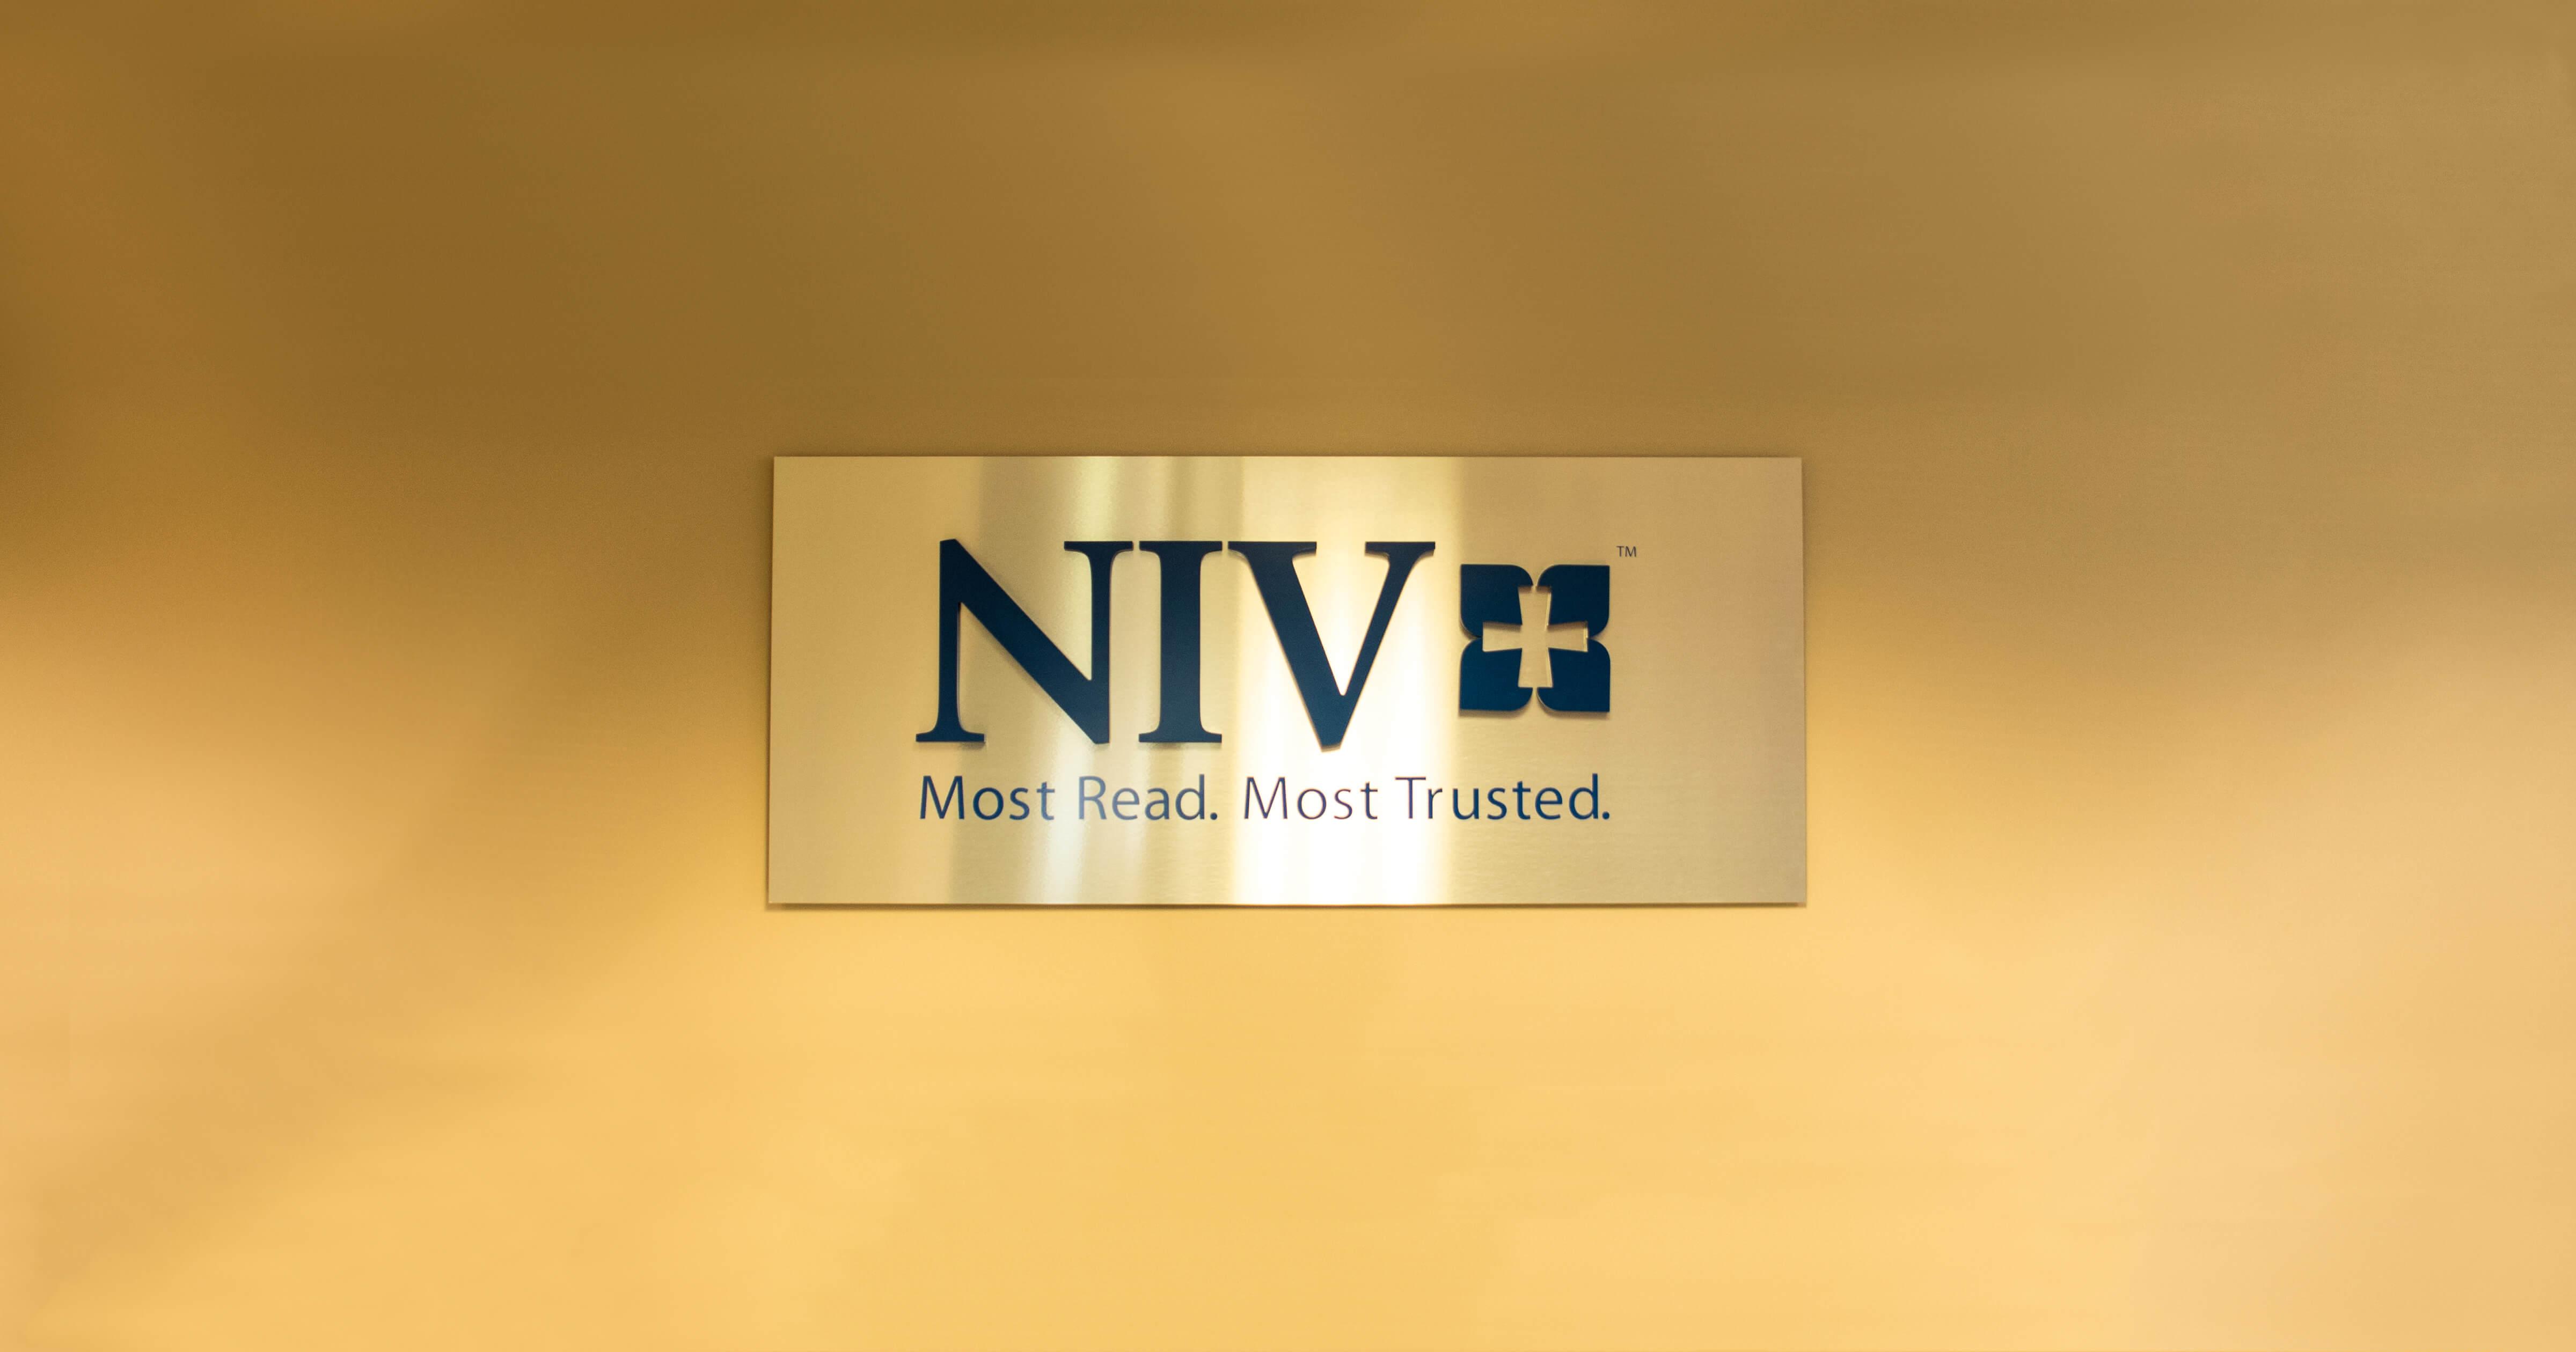 About The NIV Bible Translation